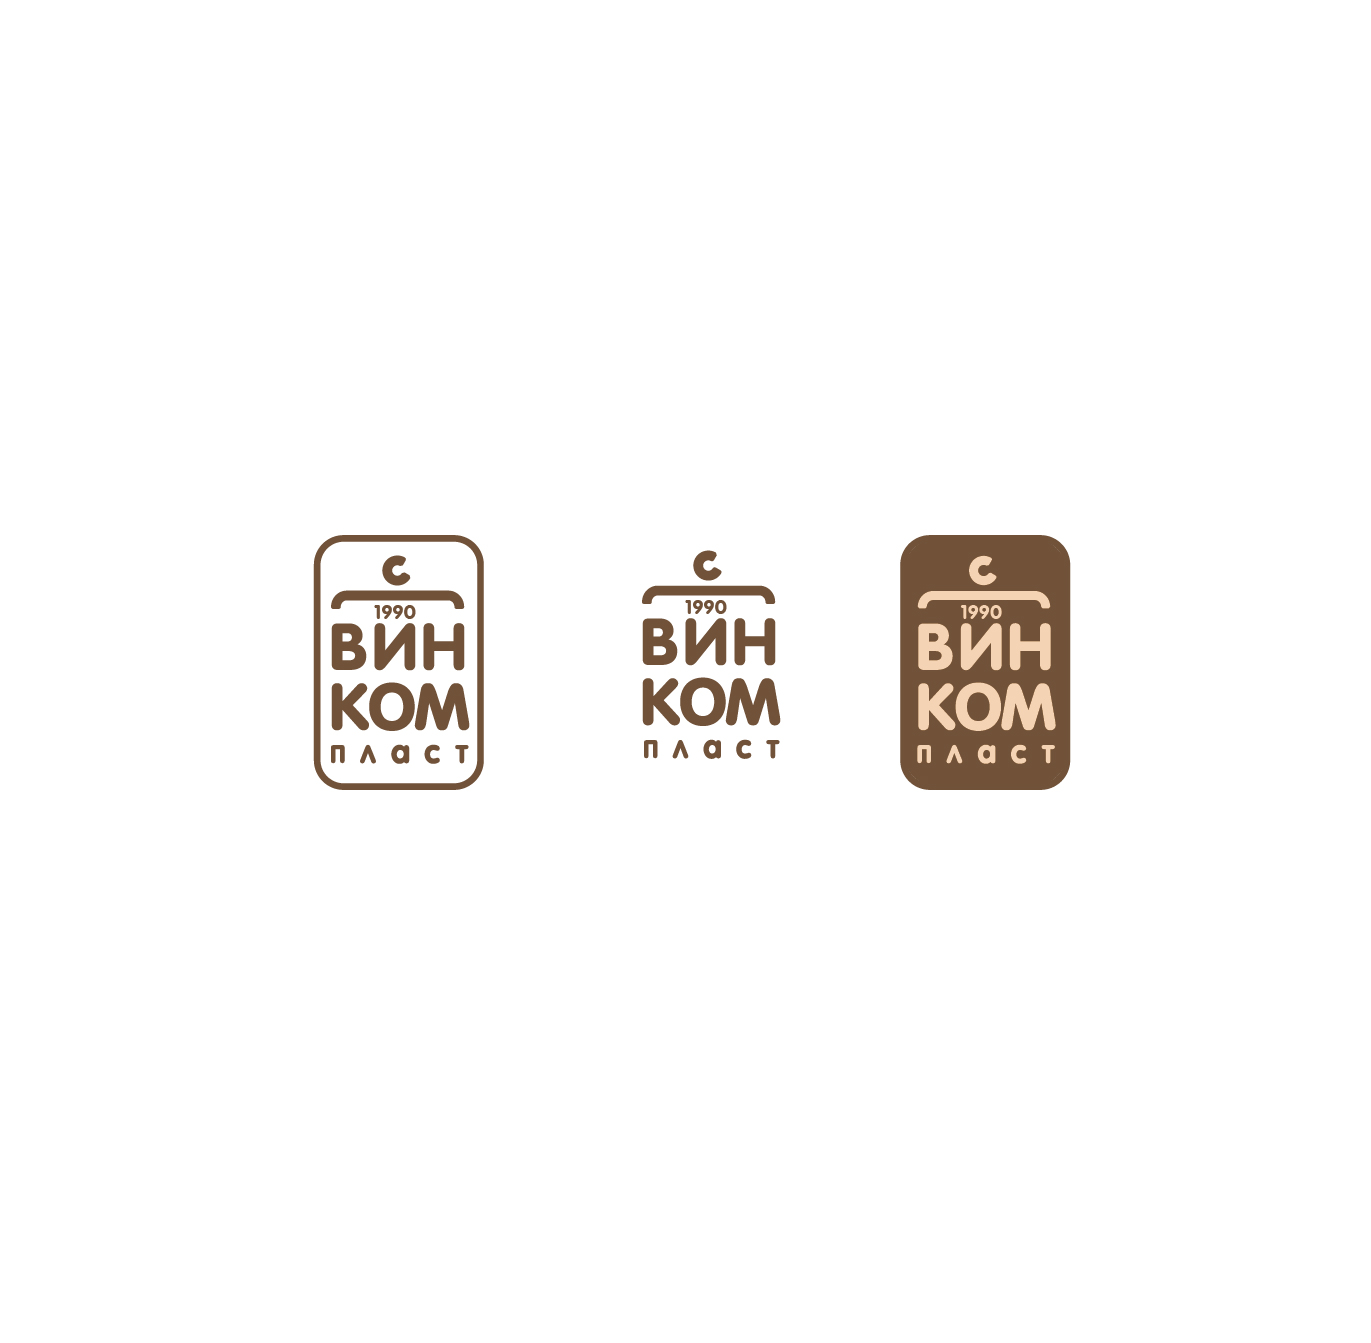 Логотип, фавикон и визитка для компании Винком Пласт  фото f_9975c385bee5120b.jpg